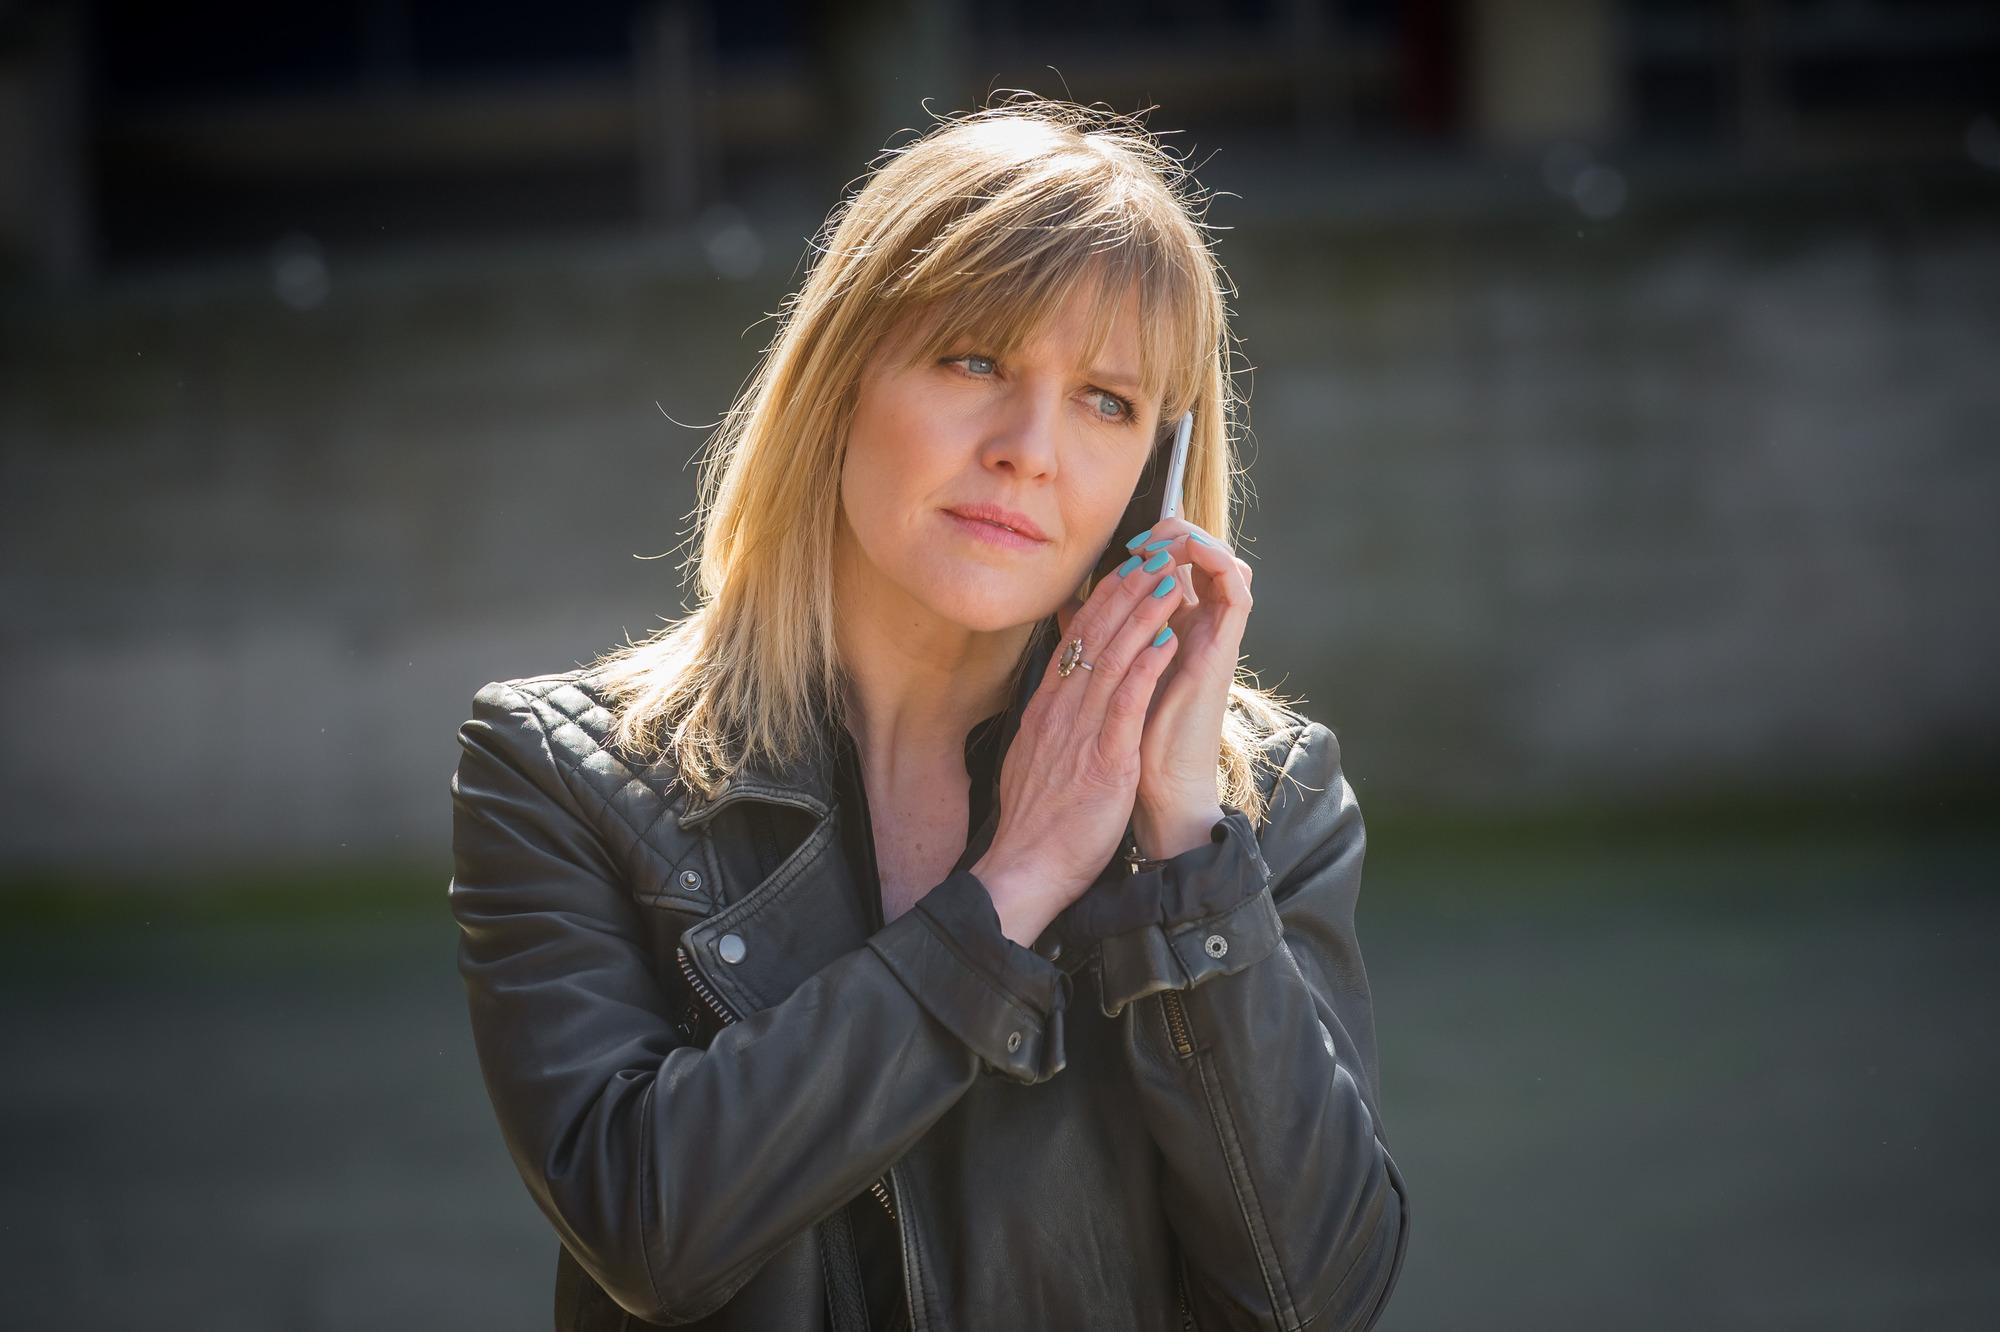 Programme Name: Love, Lies & Records - TX: n/a - Episode: n/a (No. 1) - Picture Shows: L-R Kate (ASHLEY JENSEN) - (C) Rollem Productions - Photographer: Ben Blackall